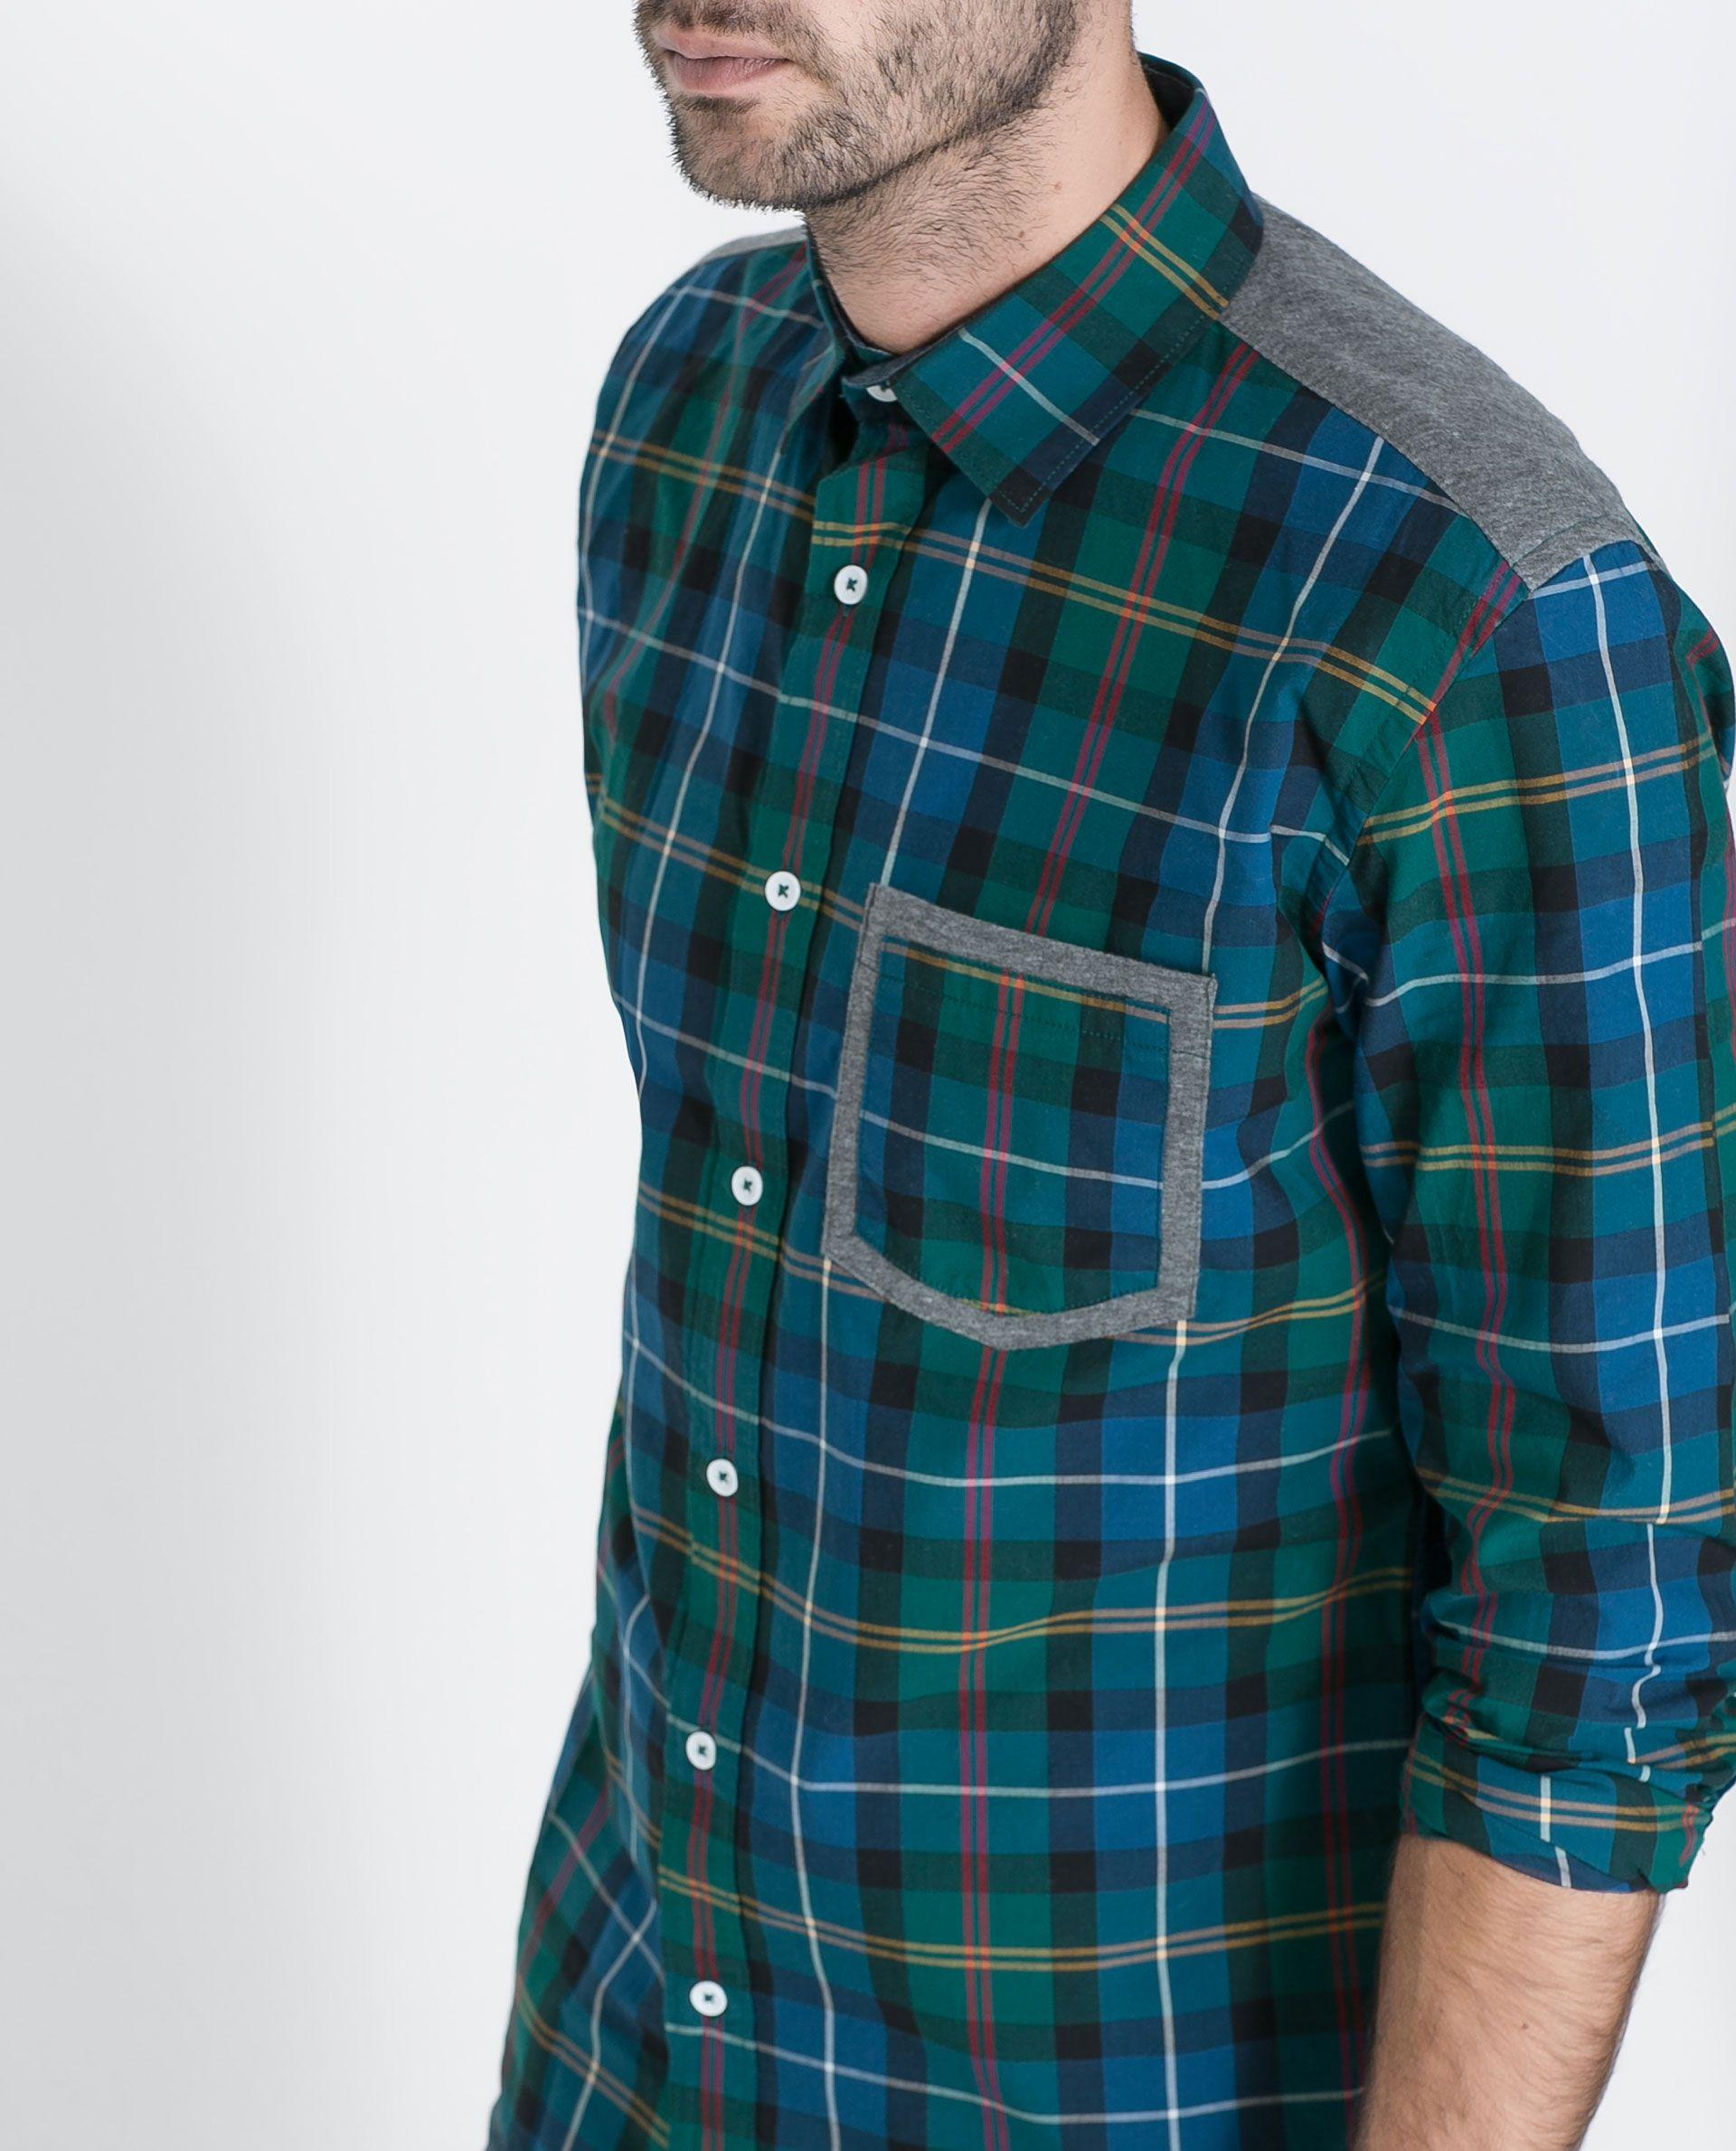 De marca para Hombre camisa de manga larga moda Casual